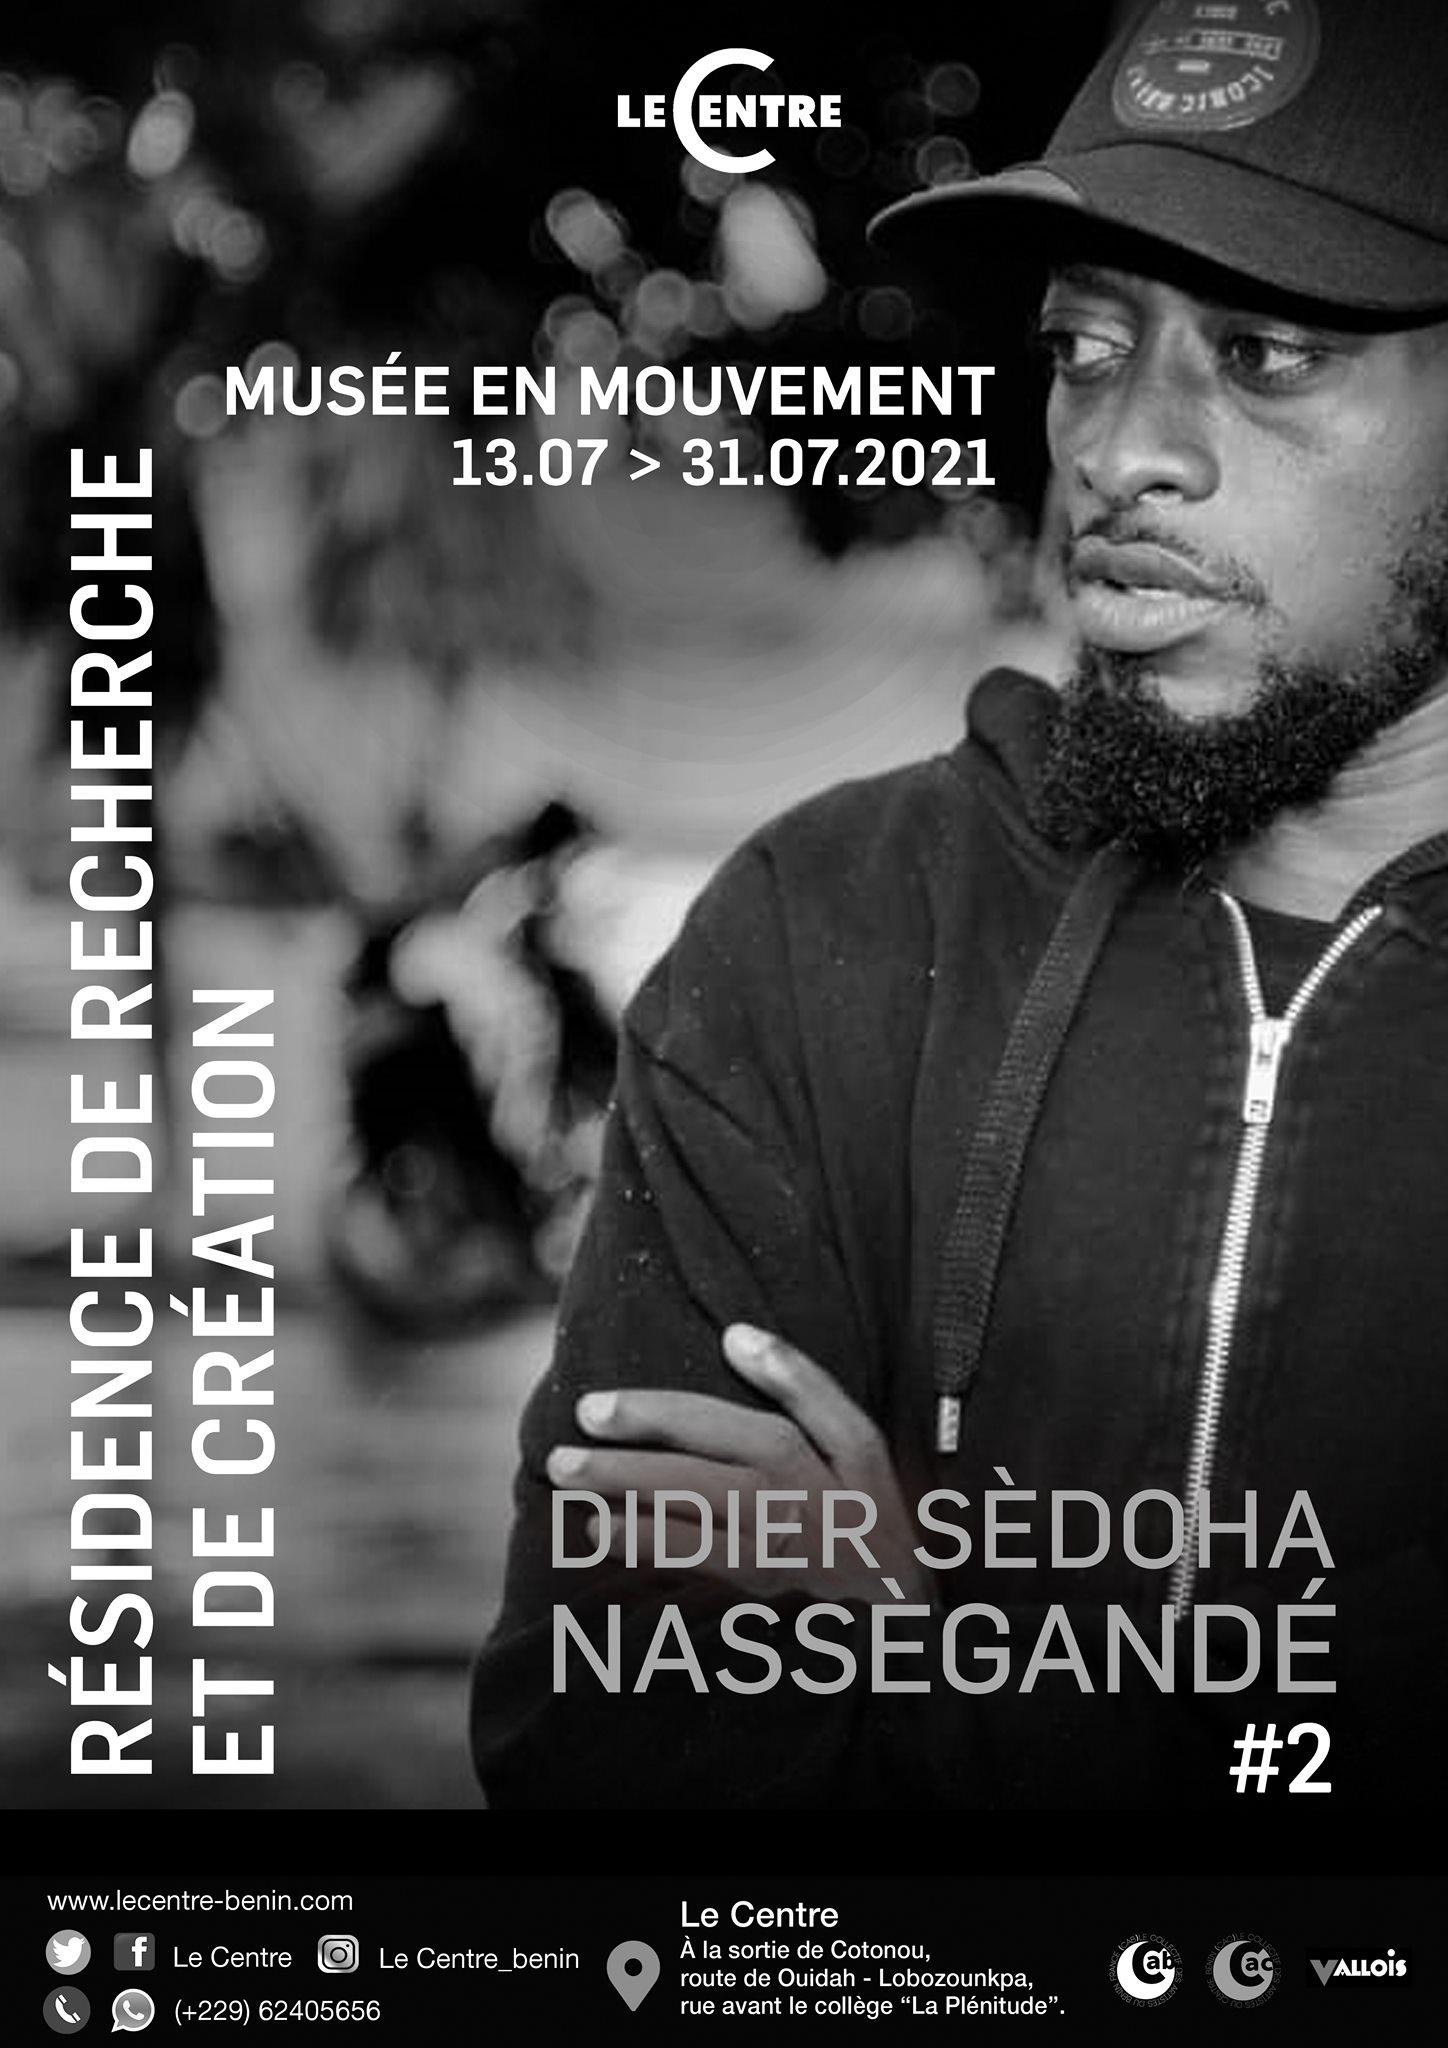 Didier Sèdoha Nassègandé #2